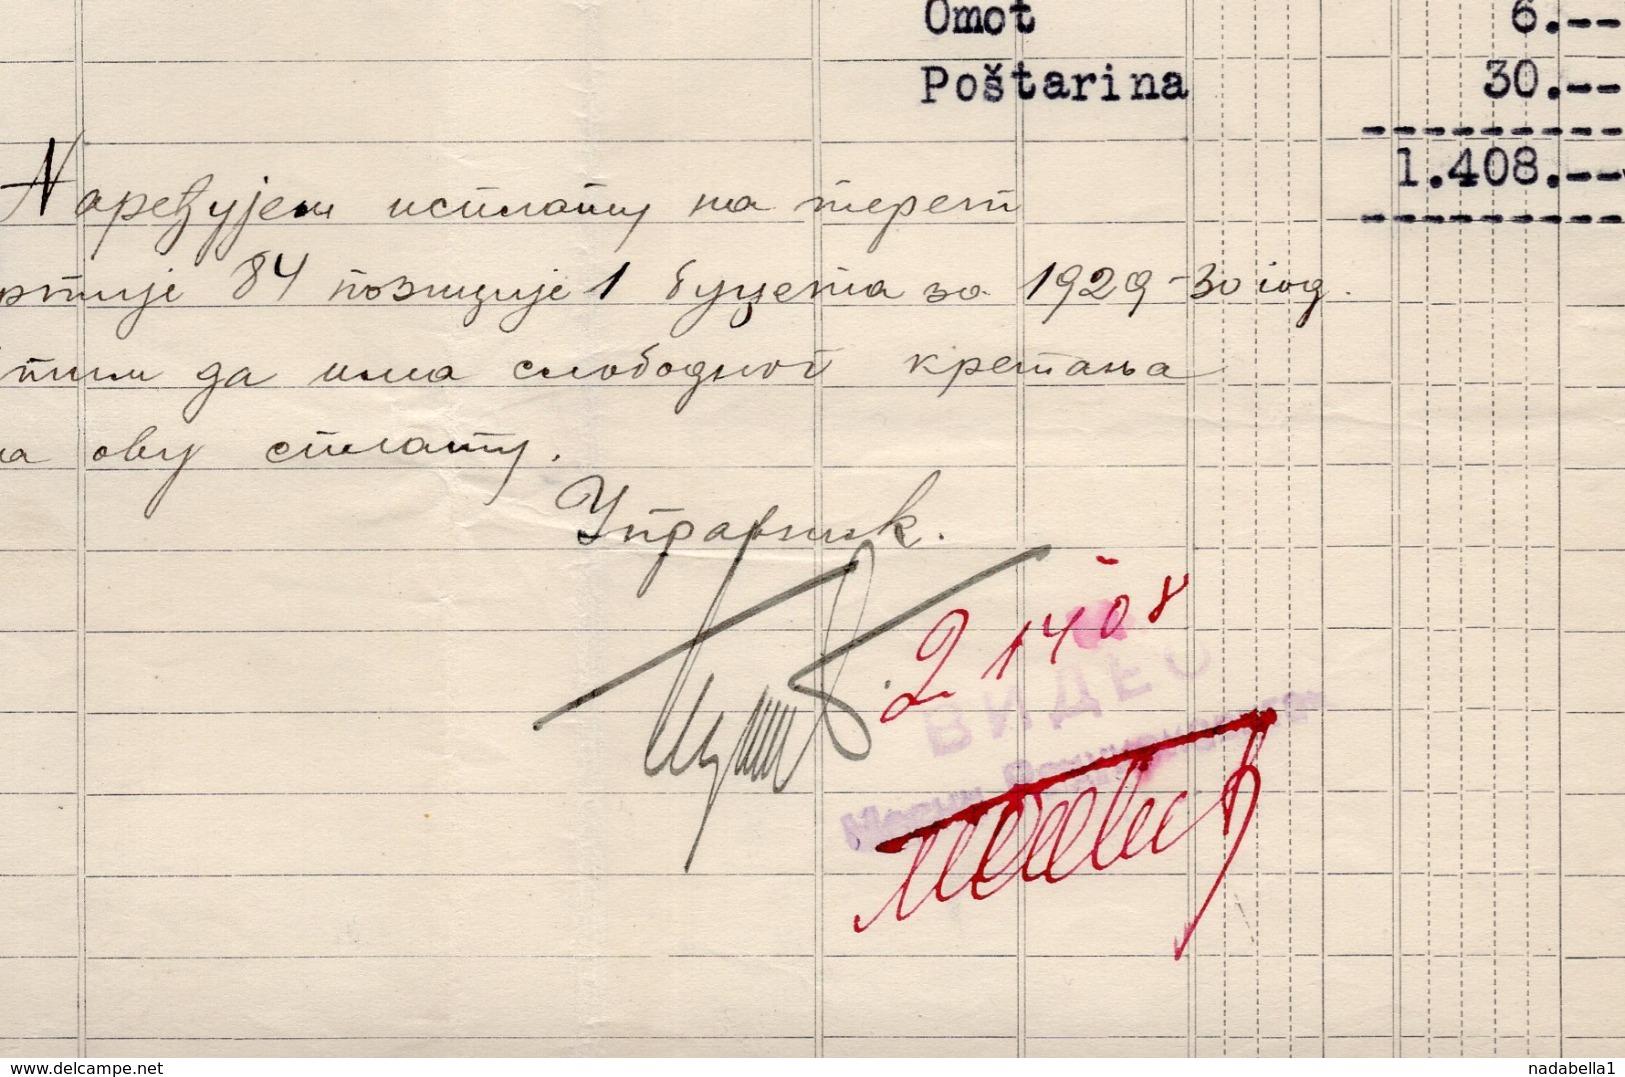 1929 YUGOSLAVIA, CROATIA, ZAGREB, NORIS, ELECTRICAL WHOLESALER, INVOICE ON LETTERHEAD, 1 FISKAL STAMP - Other